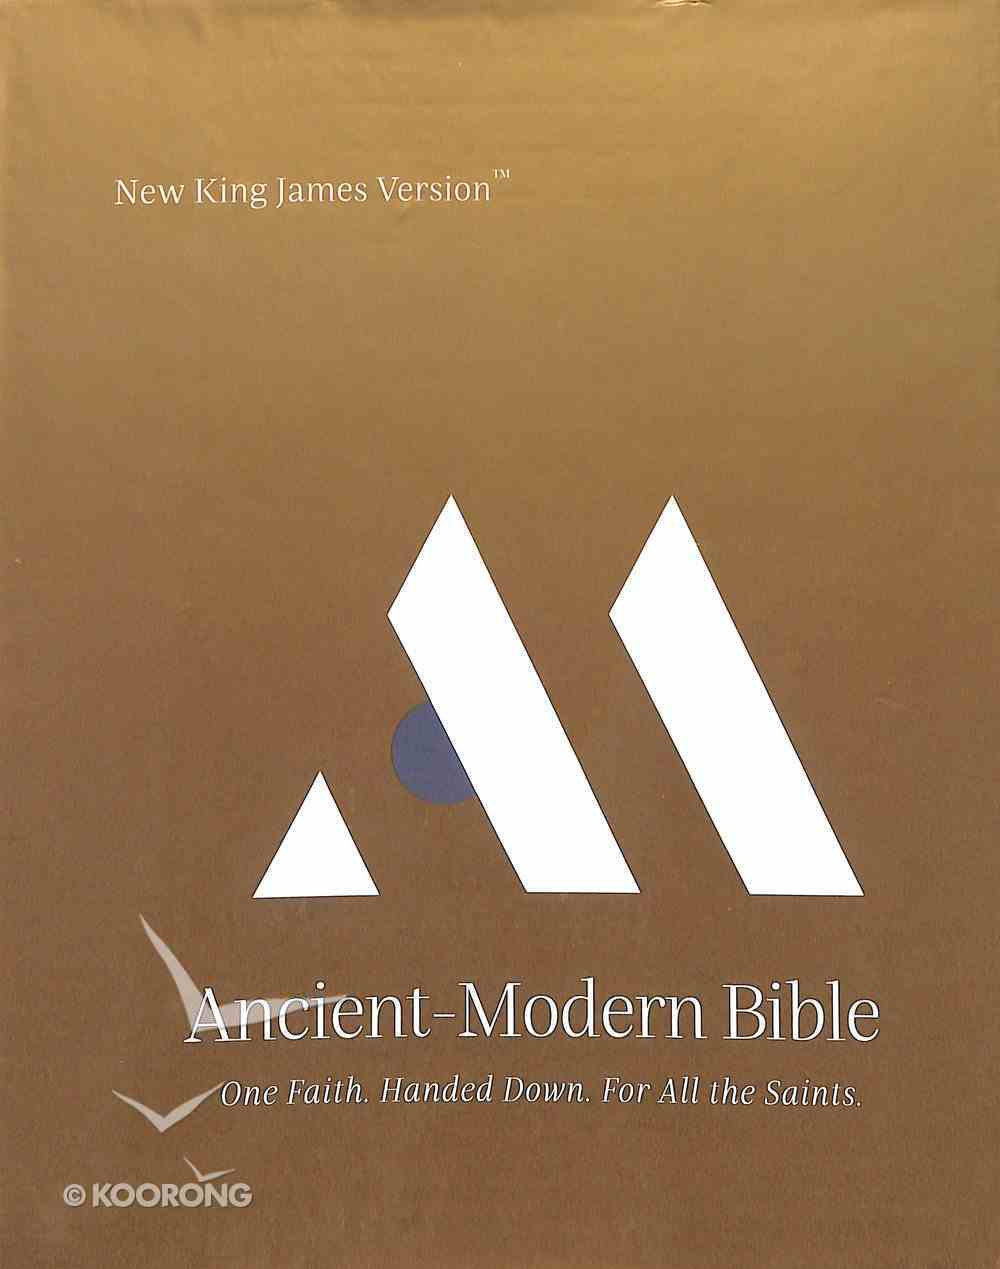 NKJV Ancient-Modern Bible Hardback